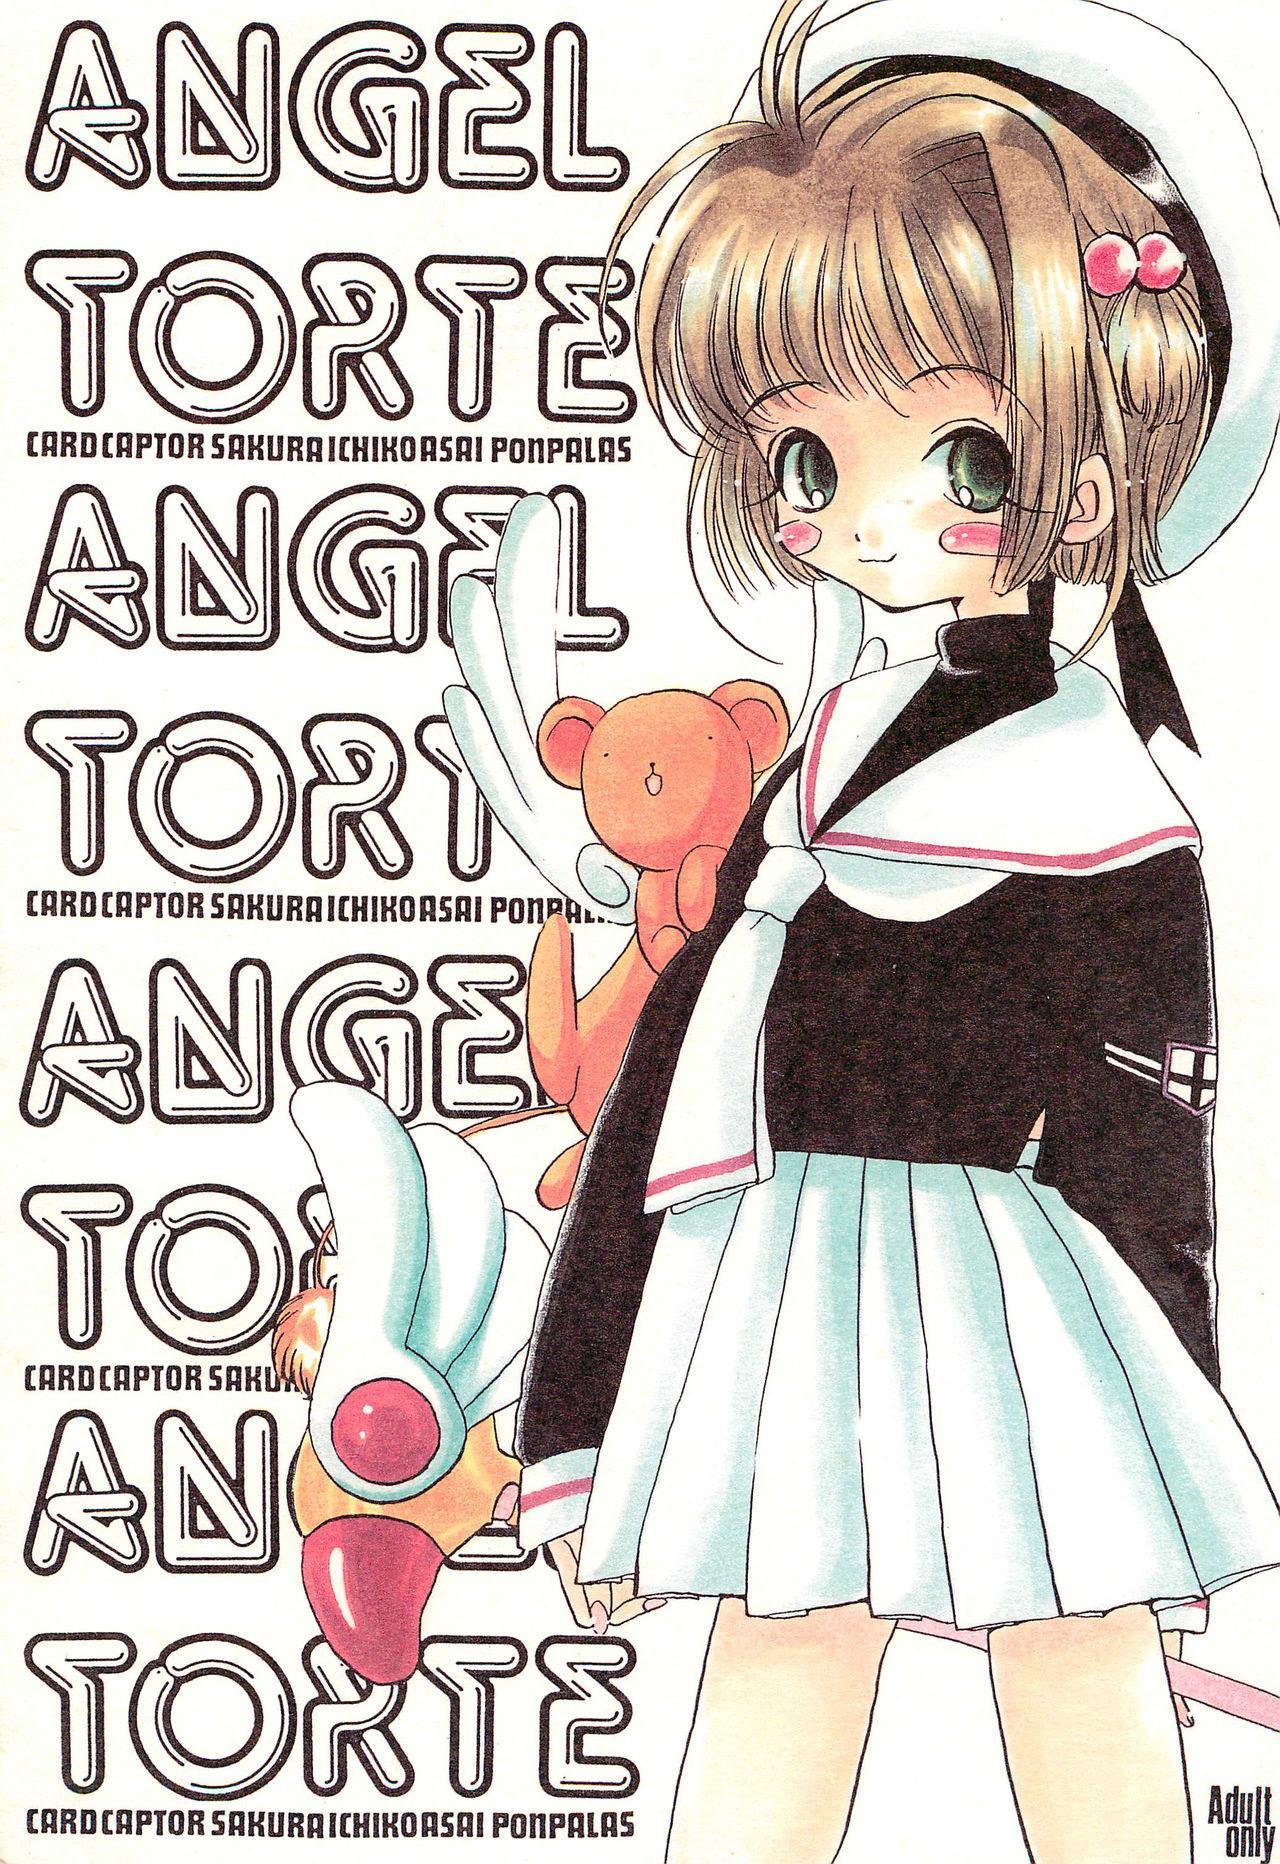 ANGEL TORTE 0